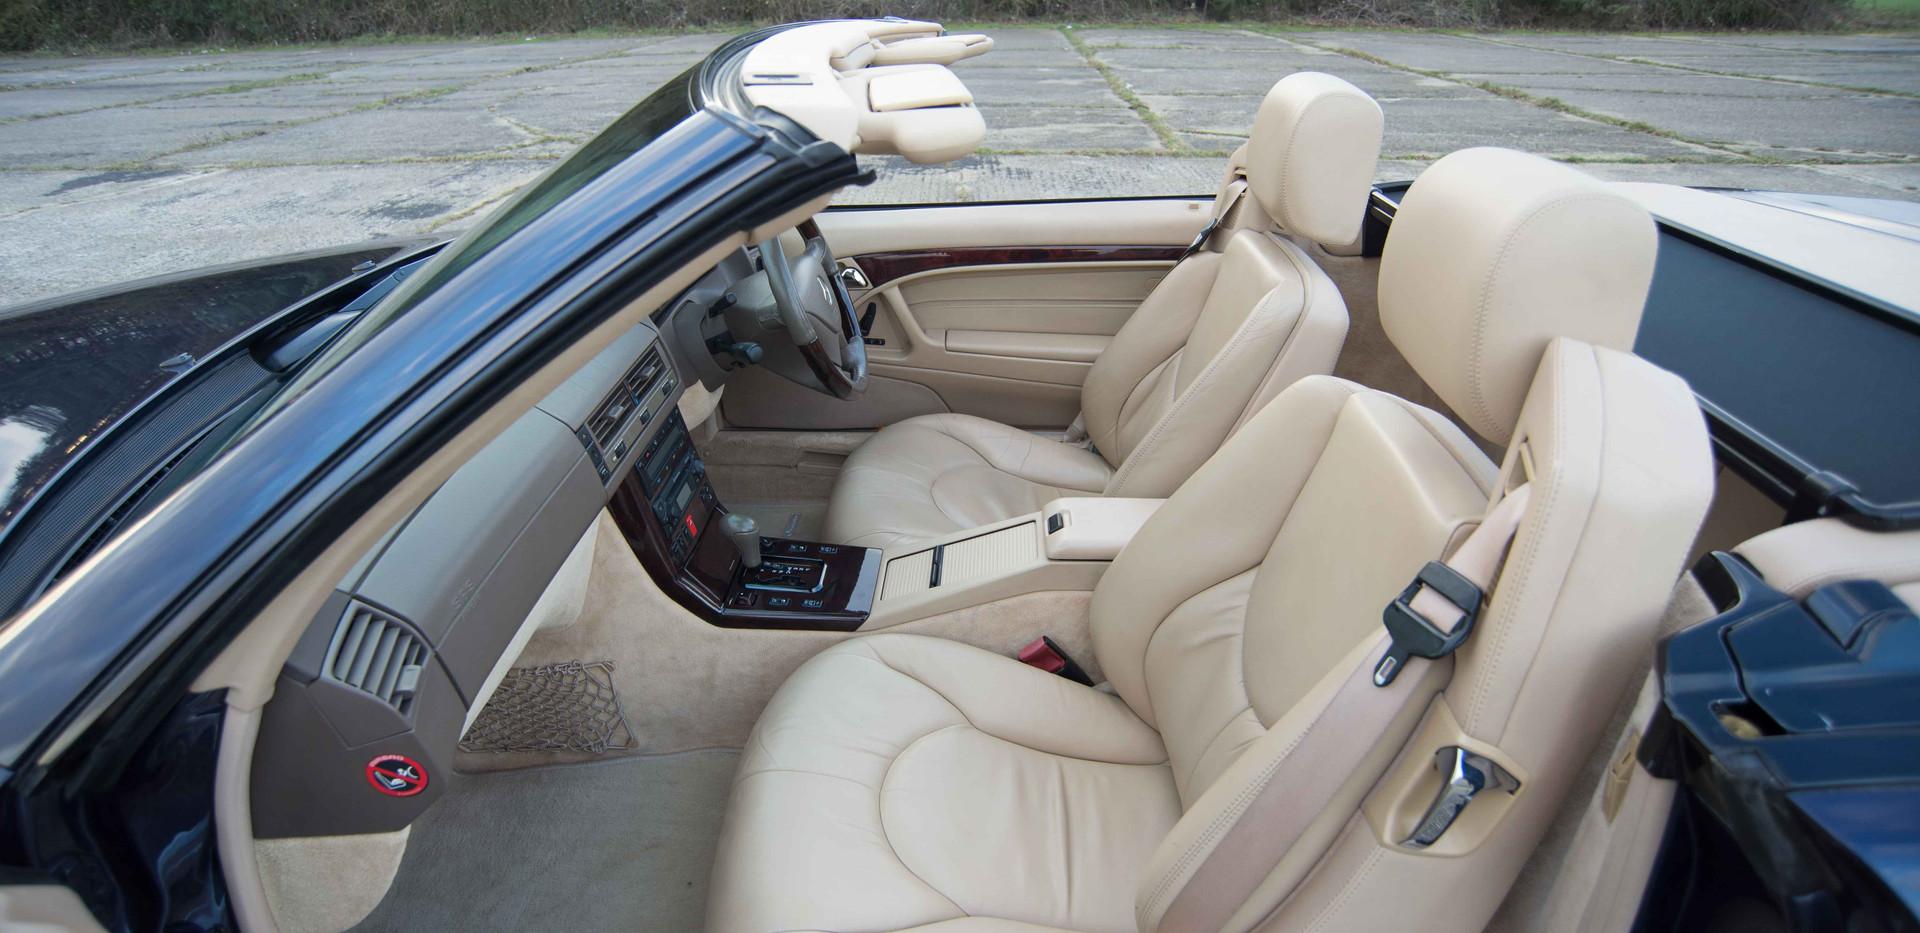 SL500 For Sale UK London  (31 of 36).jpg